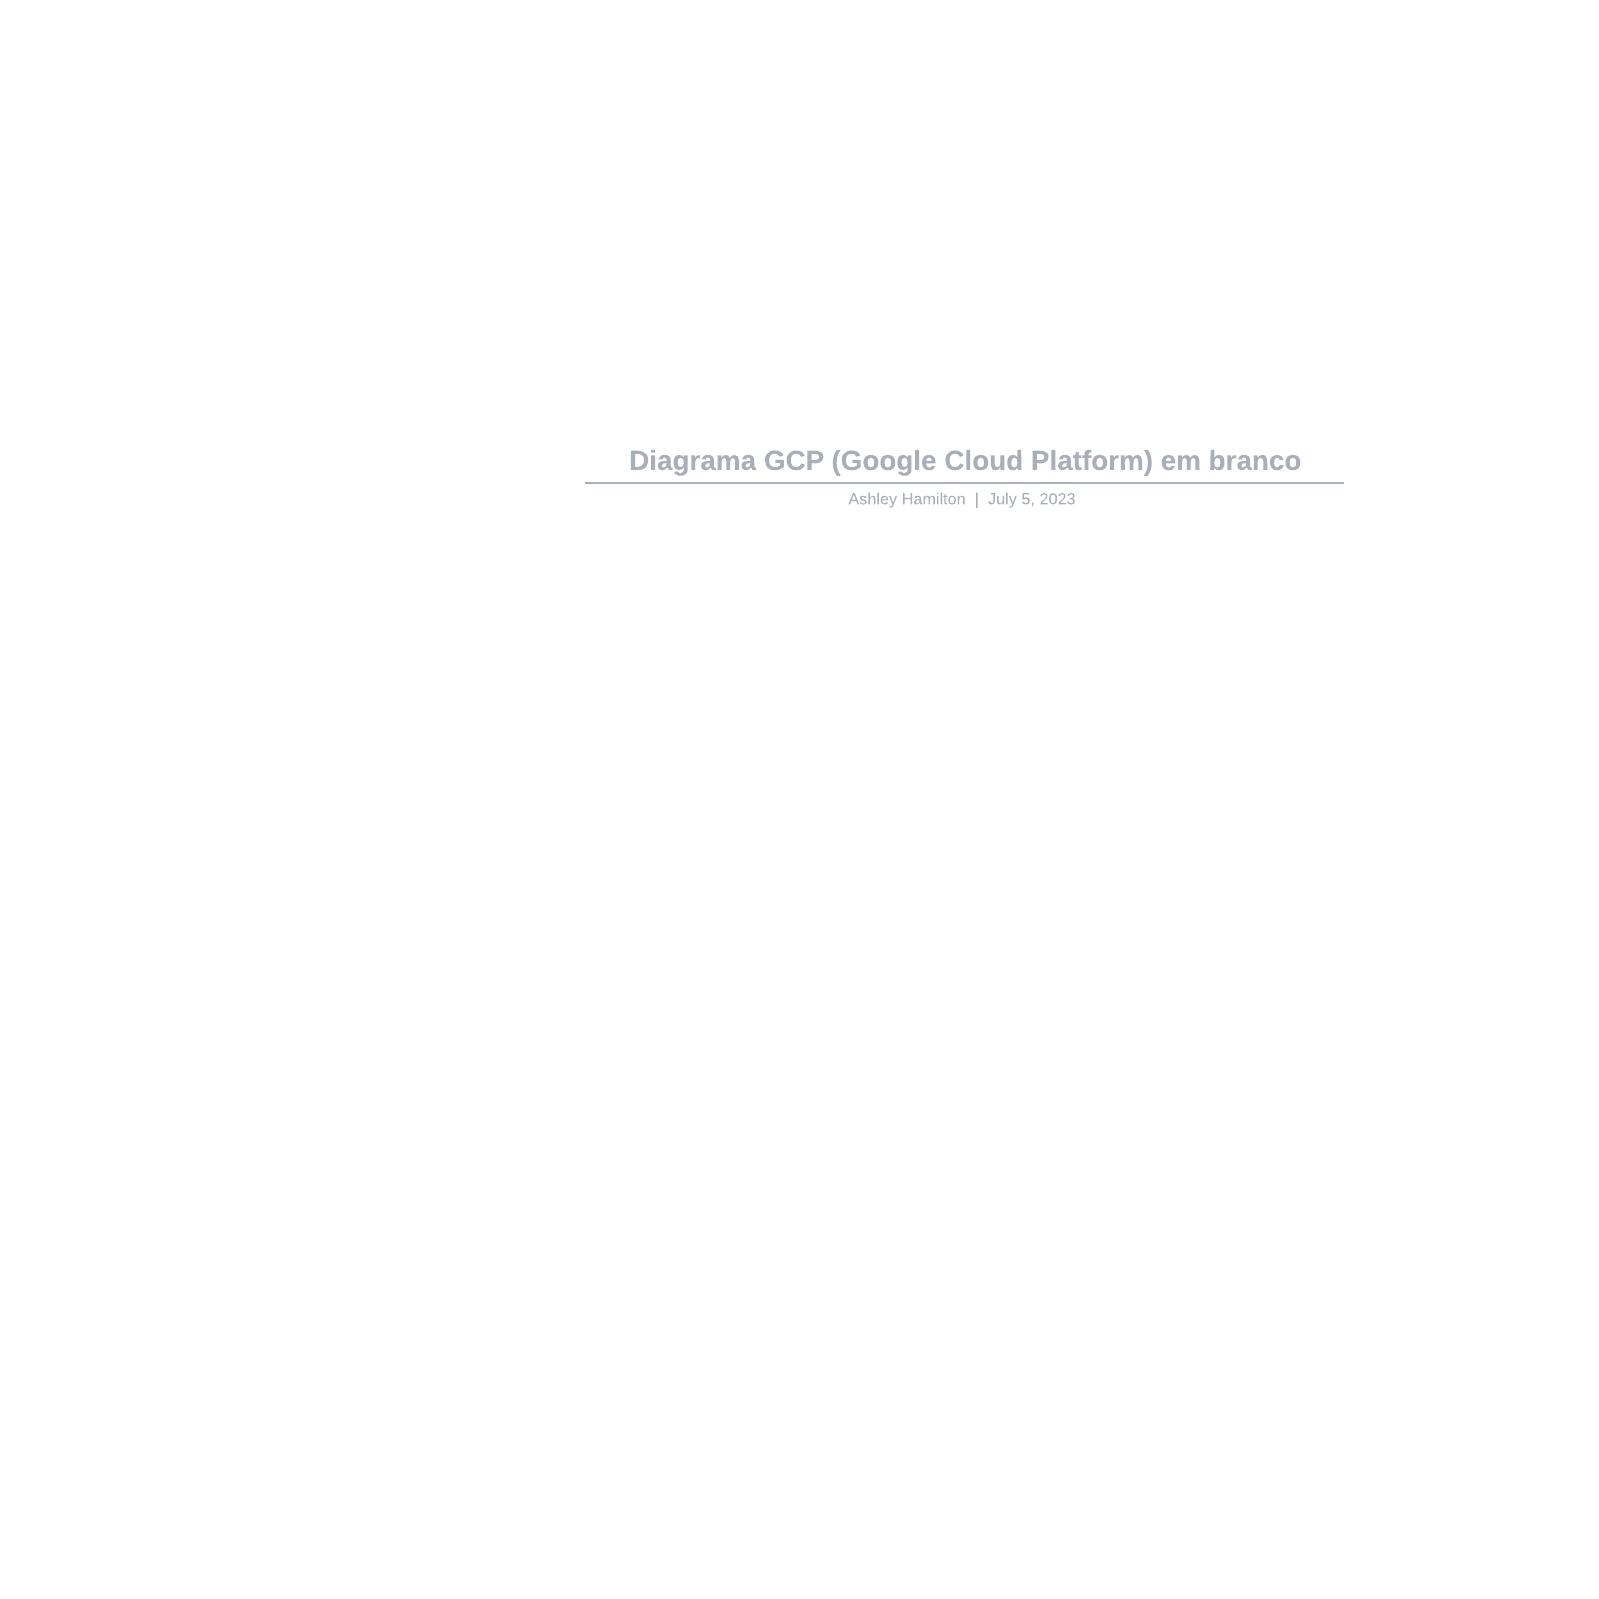 Diagrama GCP (Google Cloud Platform) em branco